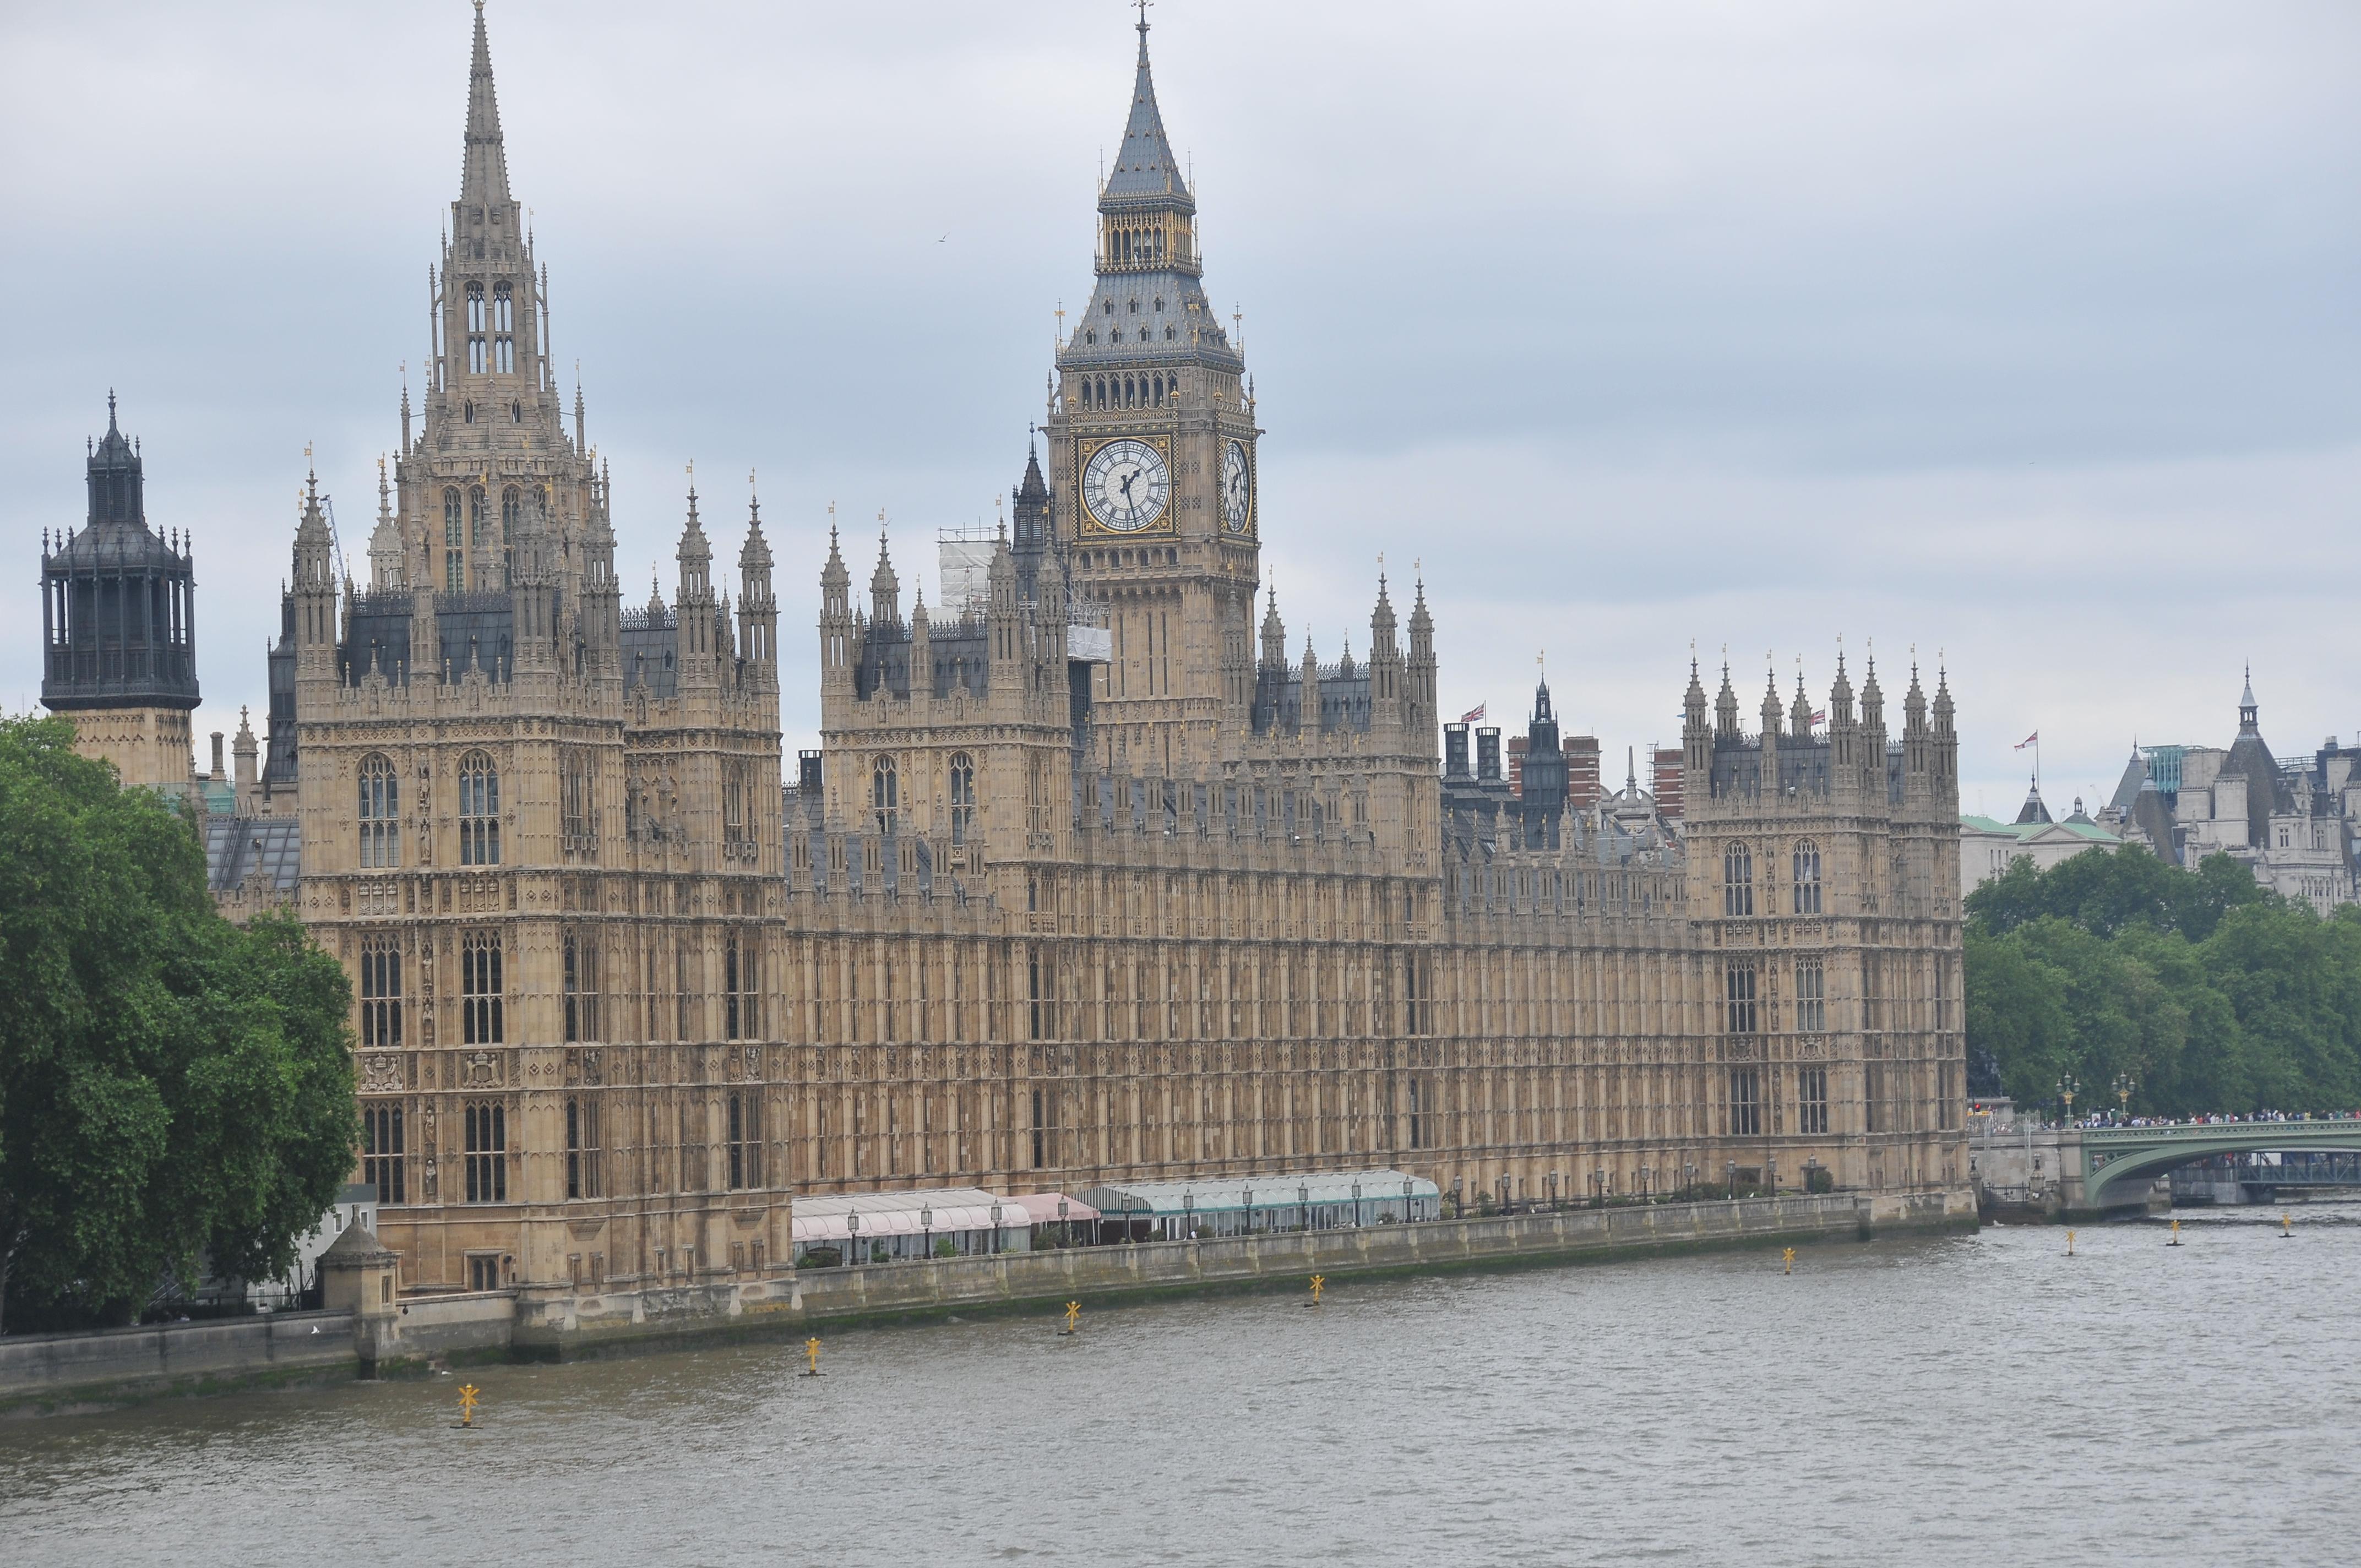 Parliment, London, England